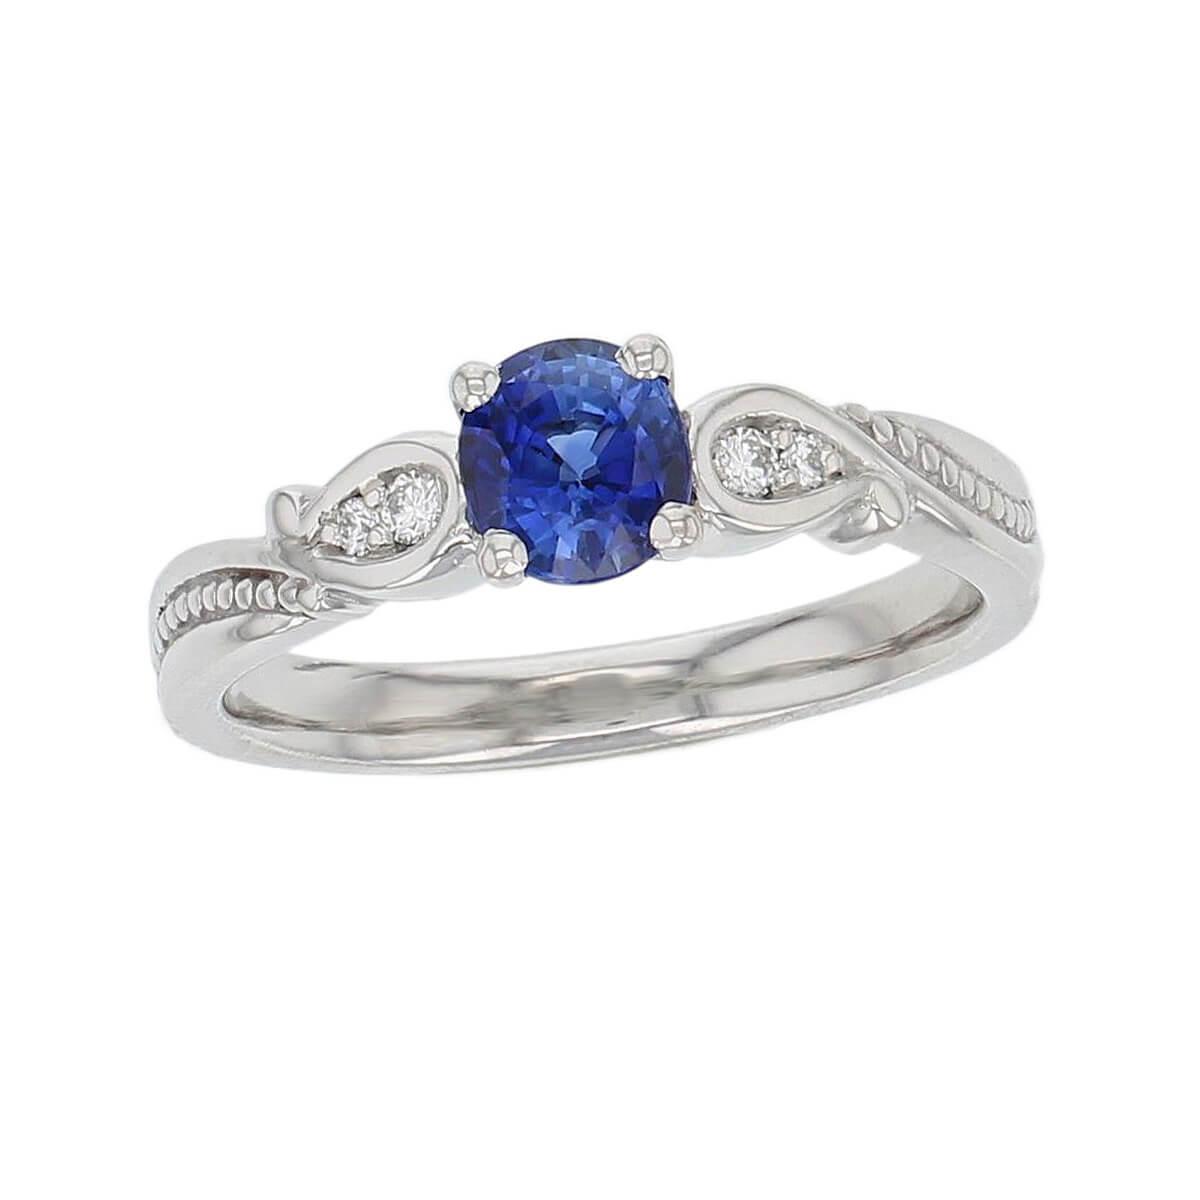 alternative engagement ring, platinum ladies oval cut blue sapphire & diamond designer multi stone engagement ring designed & hand crafted by Faller of Derry/ Londonderry, dress ring, precious gem jewellery, jewelry, shoulder set, vintage, art nouveau, filigree